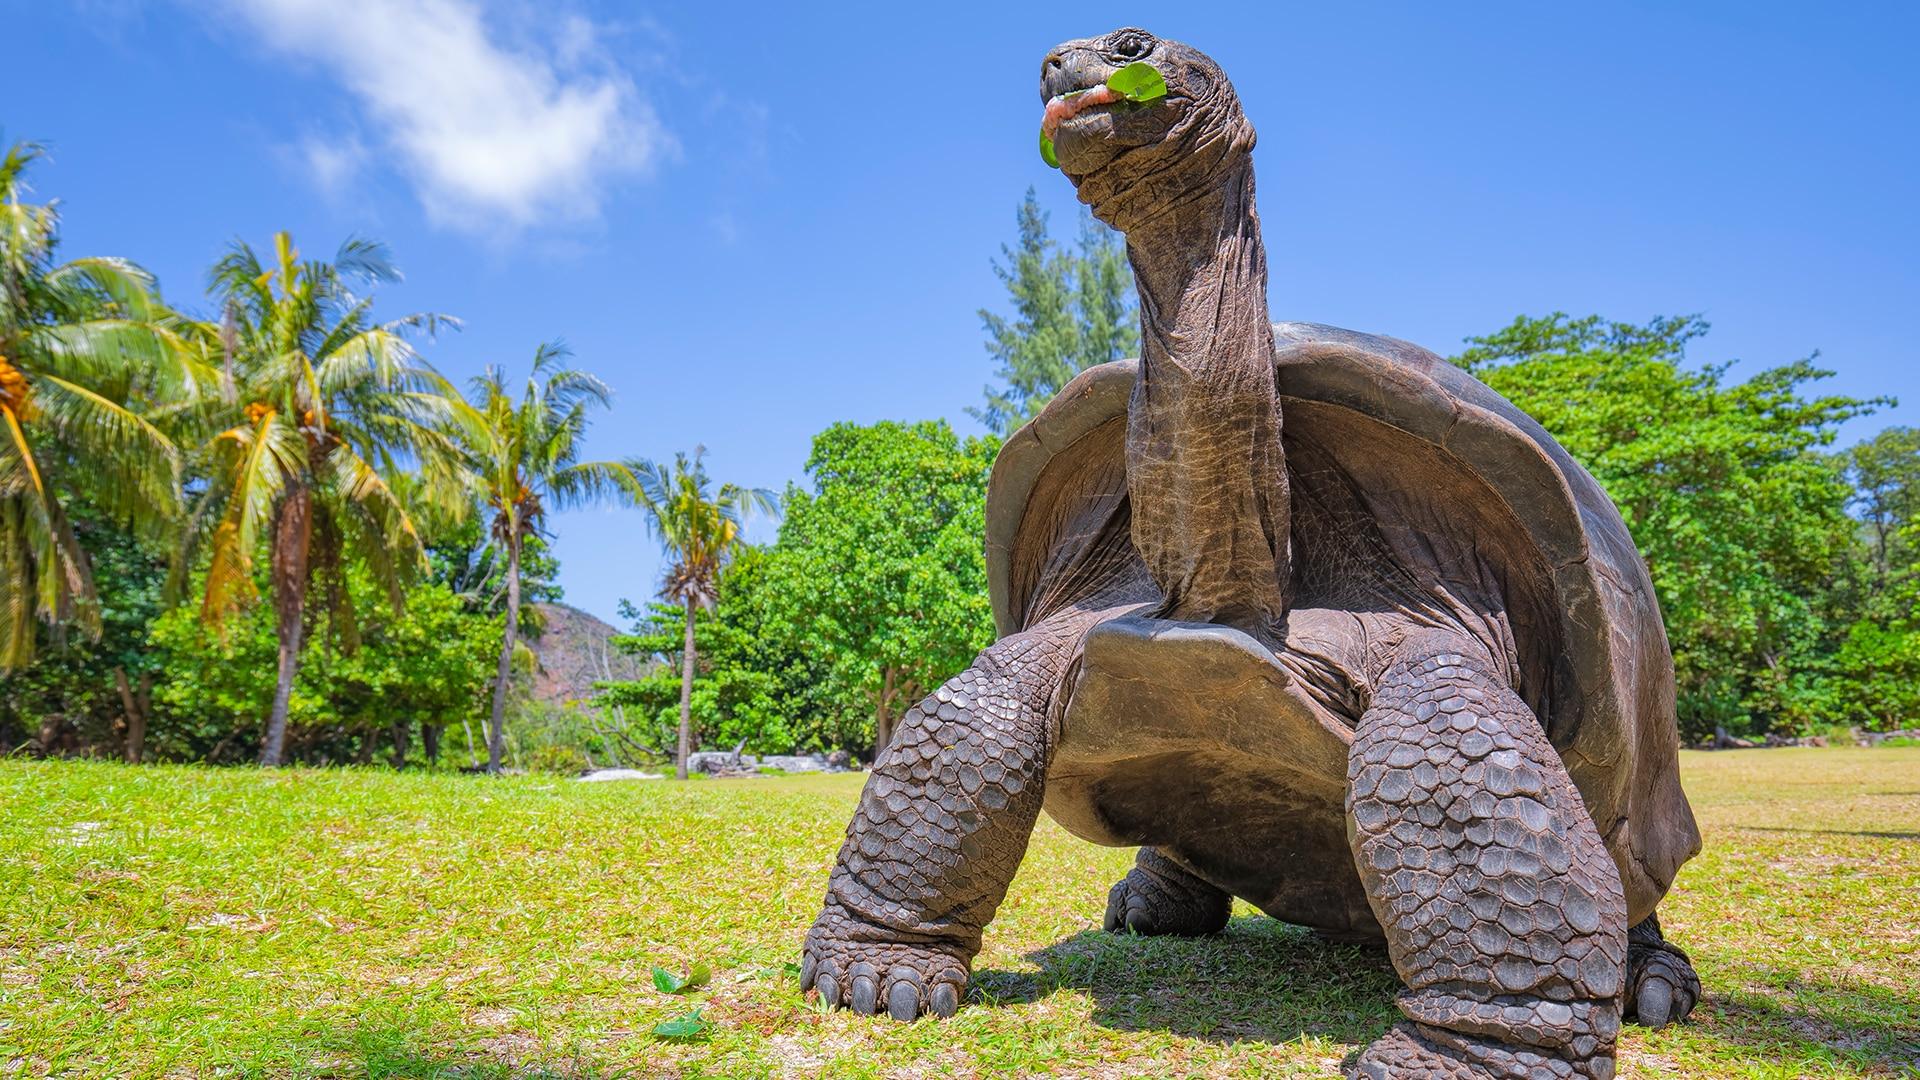 Giant tortoise in Seychelles